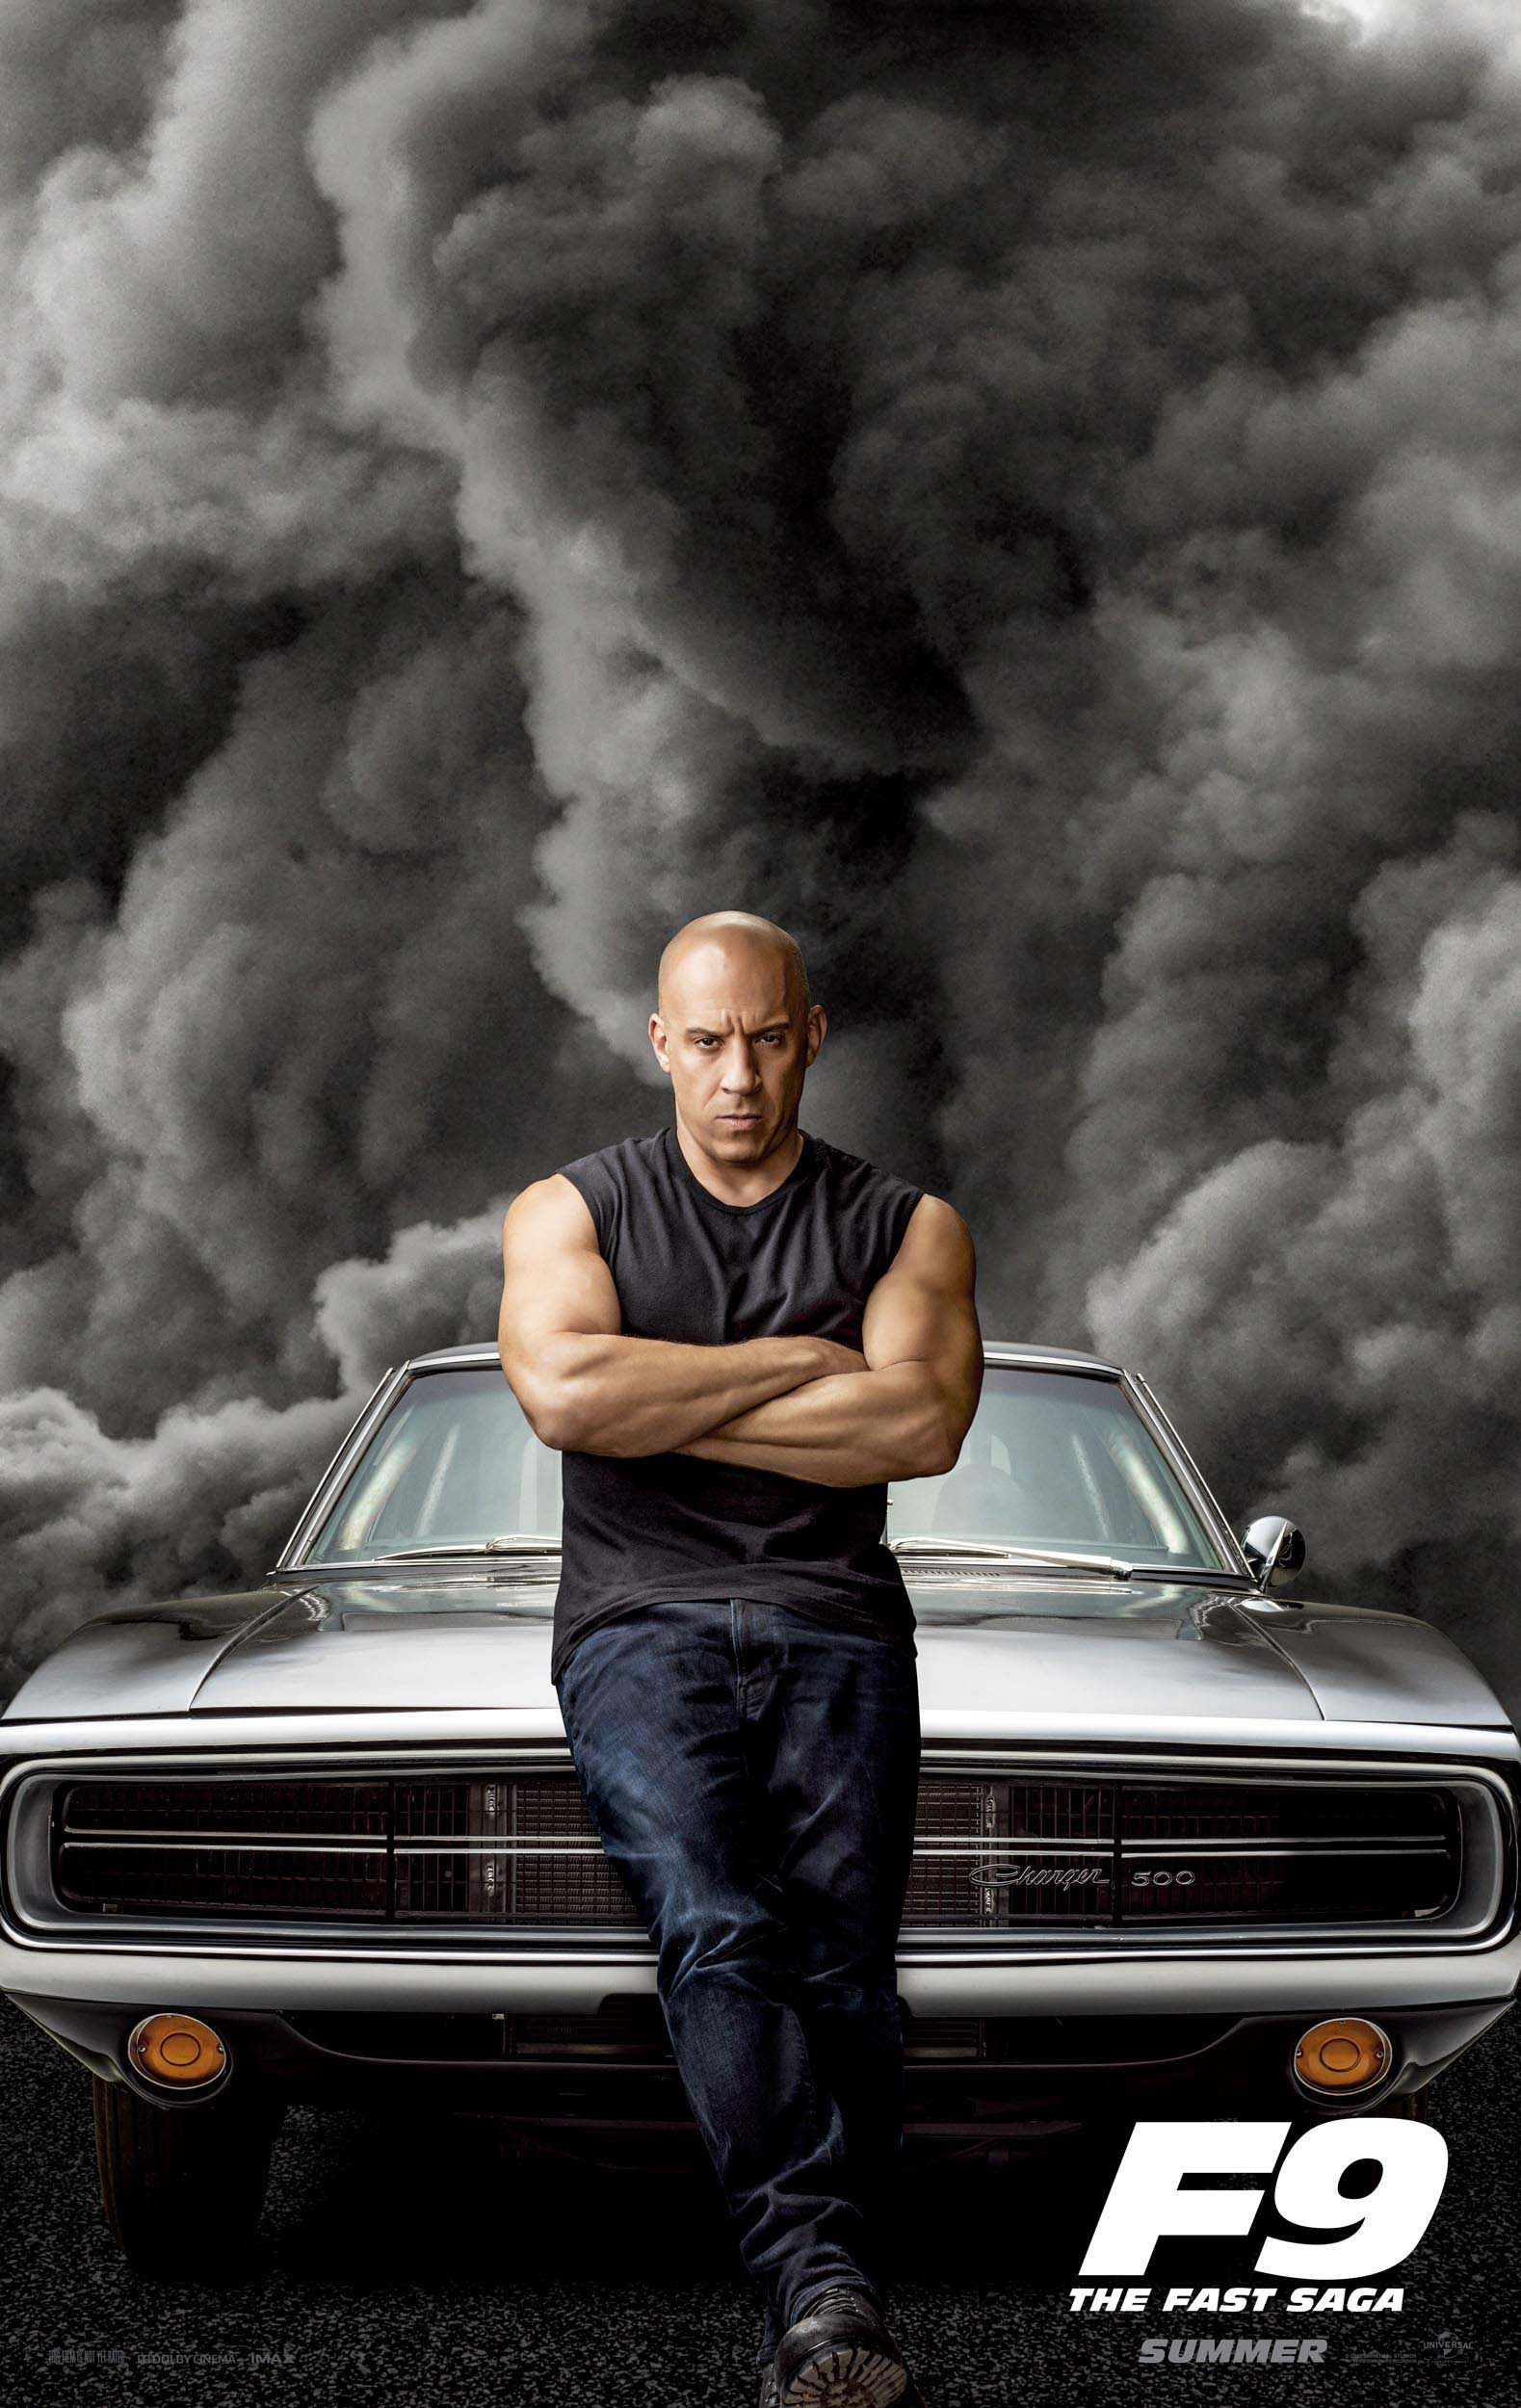 دانلود فیلم Fast and Furious 9 2020